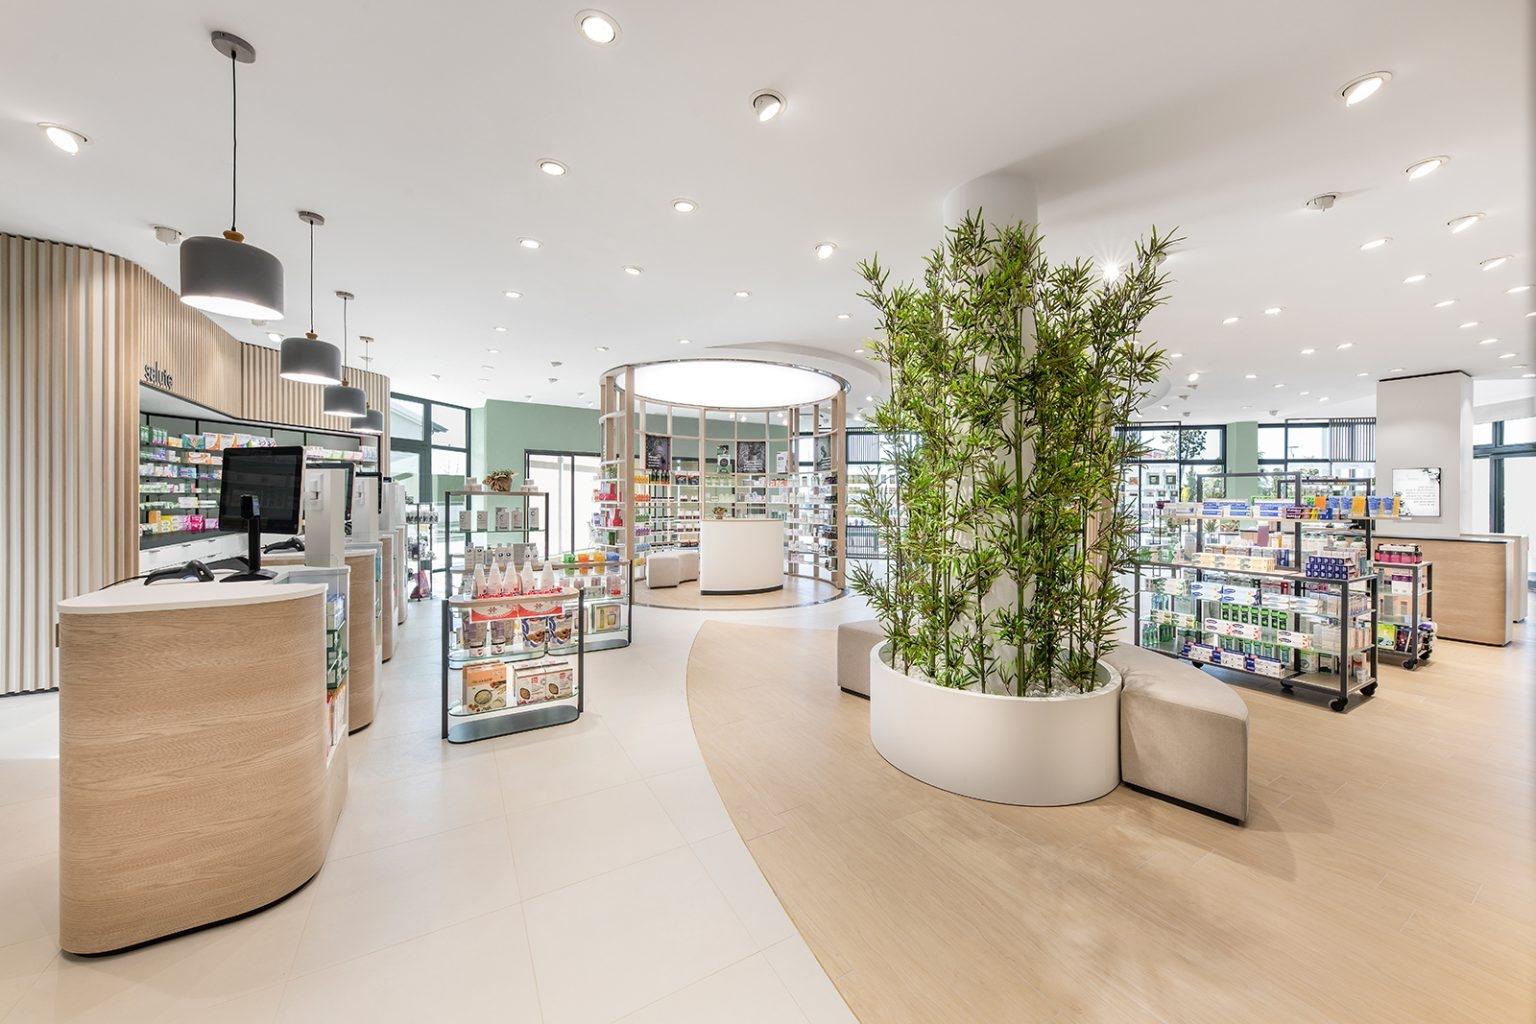 Shopping experience in Farmacia Essenza by Amlab